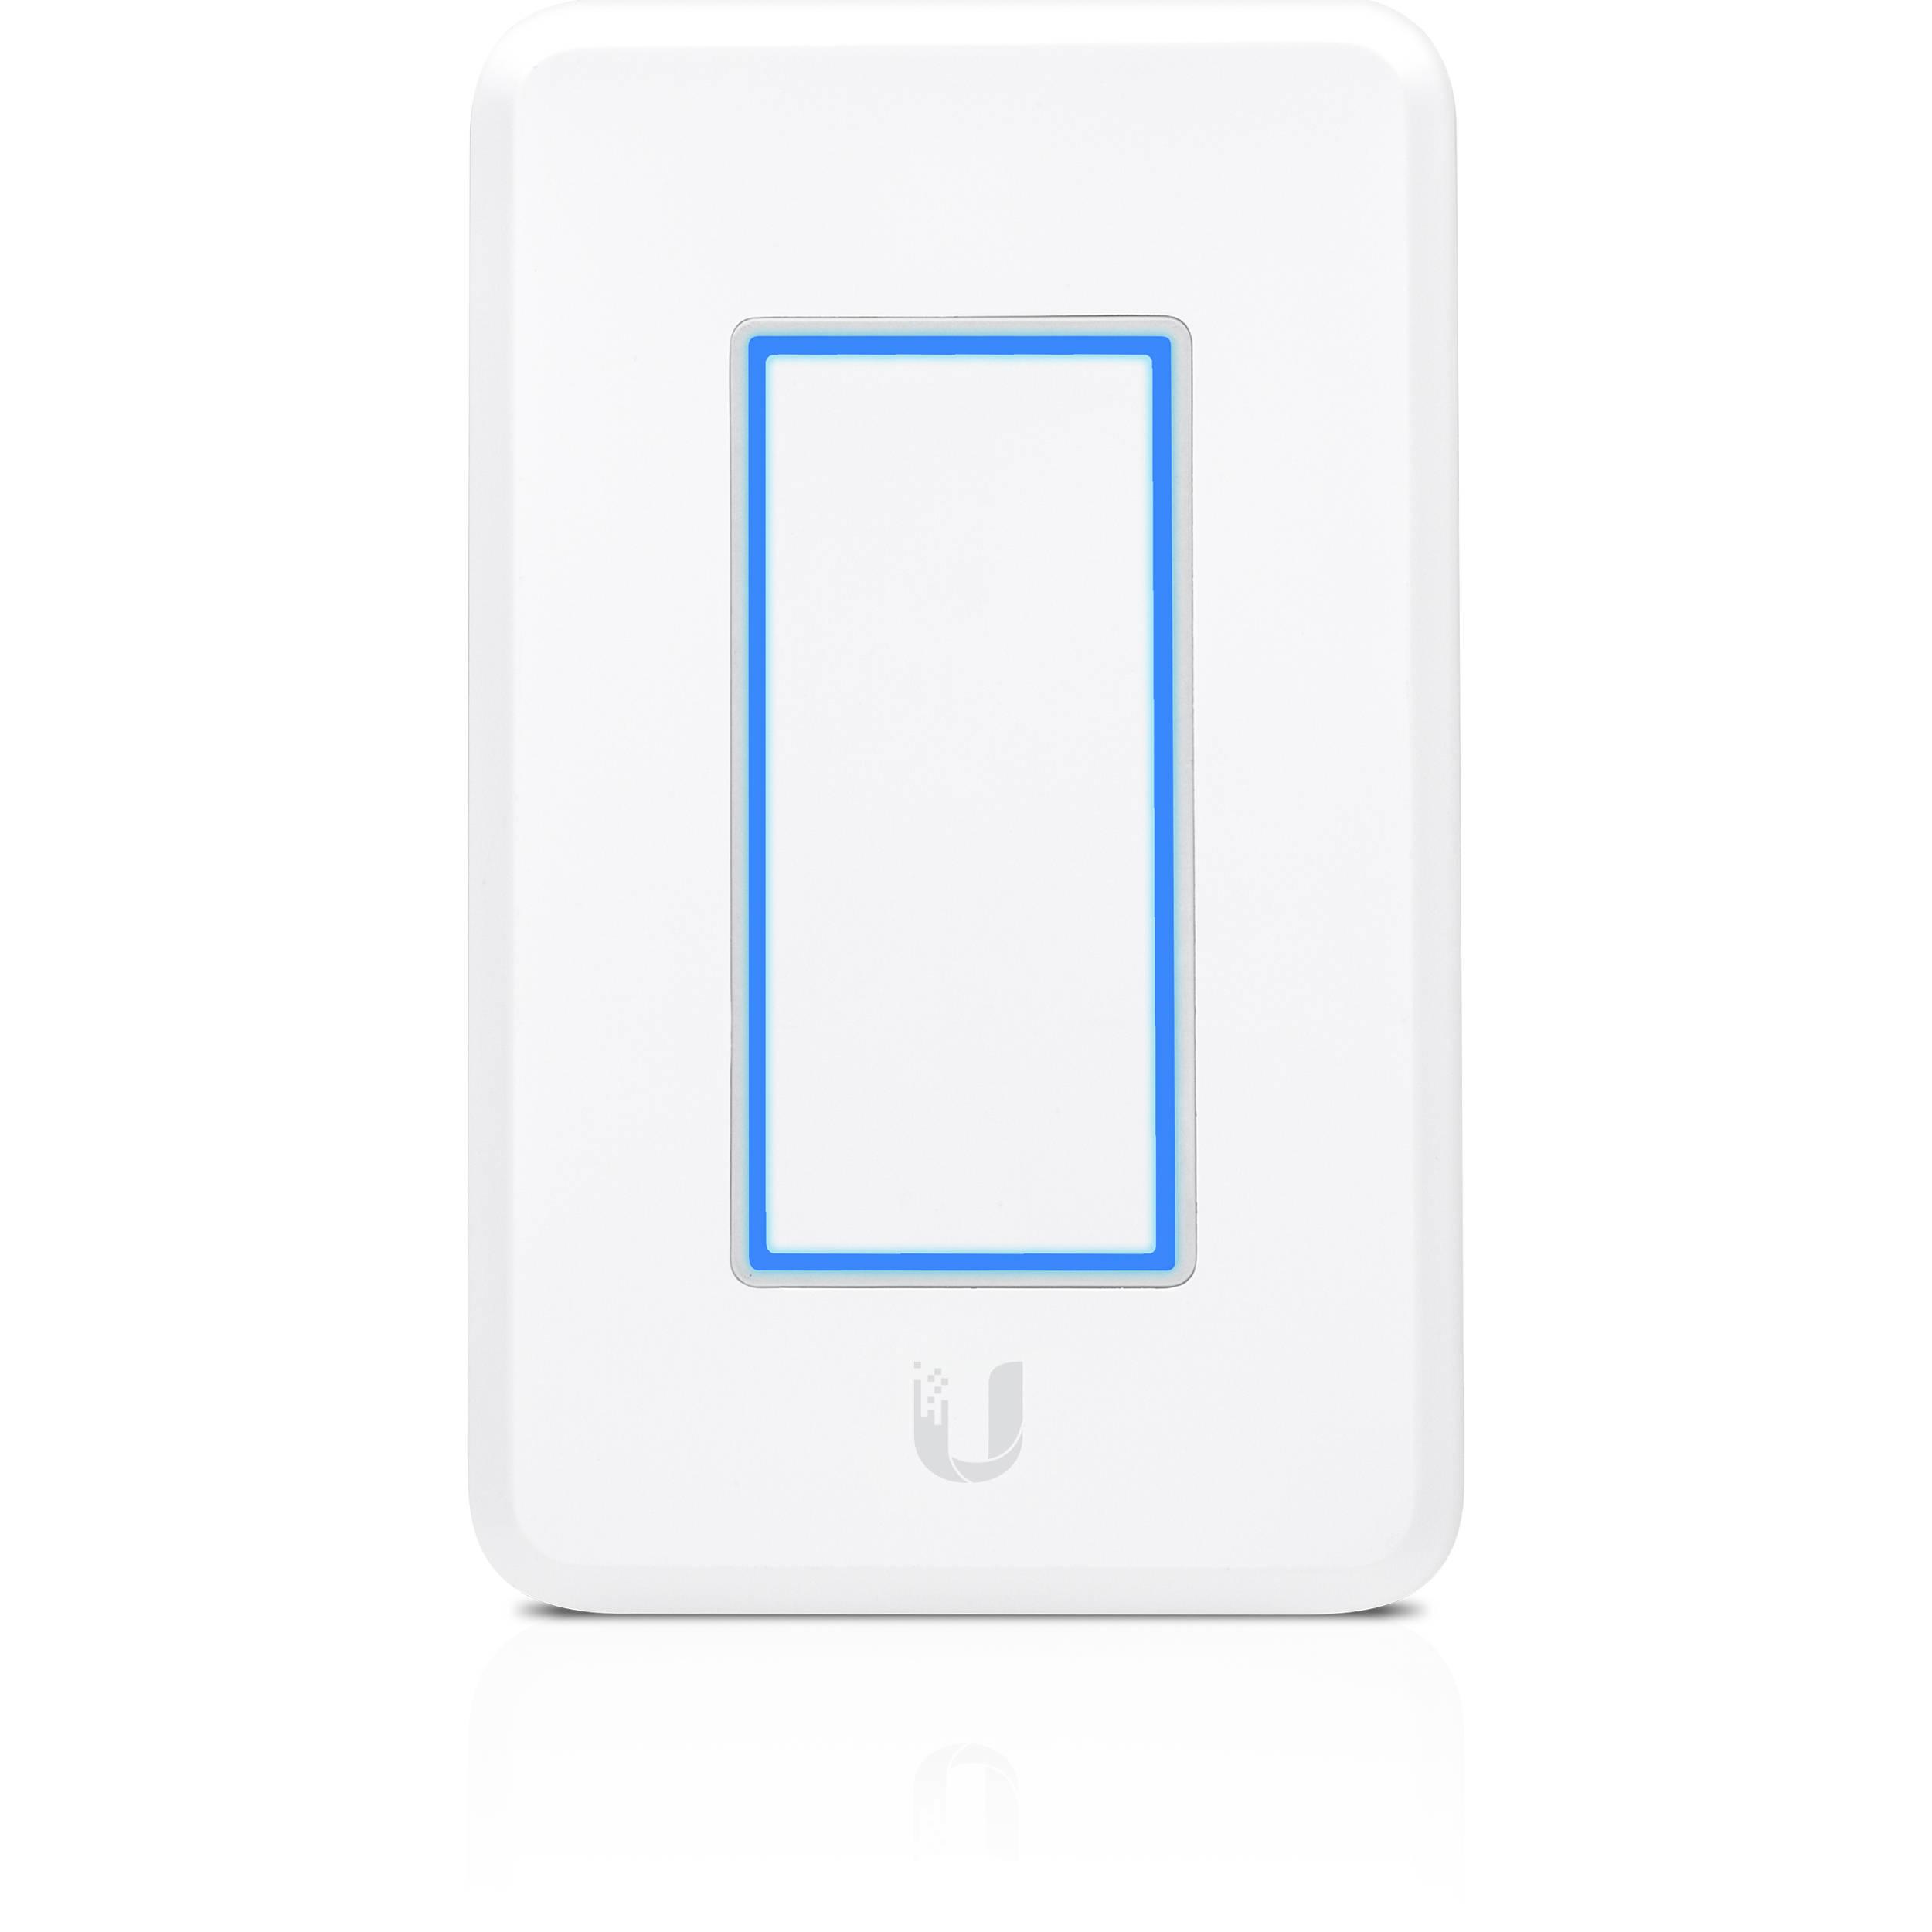 Ubiquiti Networks Udim At Unifi Dimmer Switch Udim At B Amp H